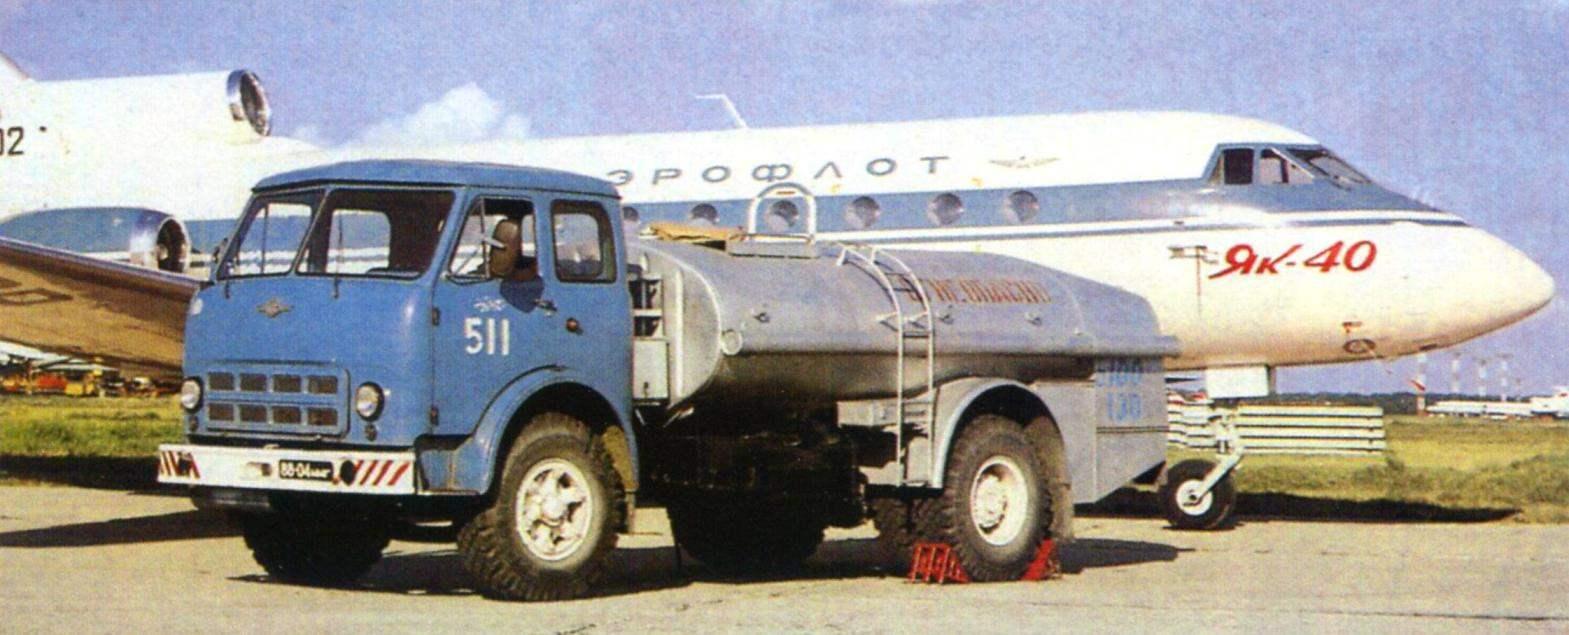 Tanker Т3А-7, 5-500A